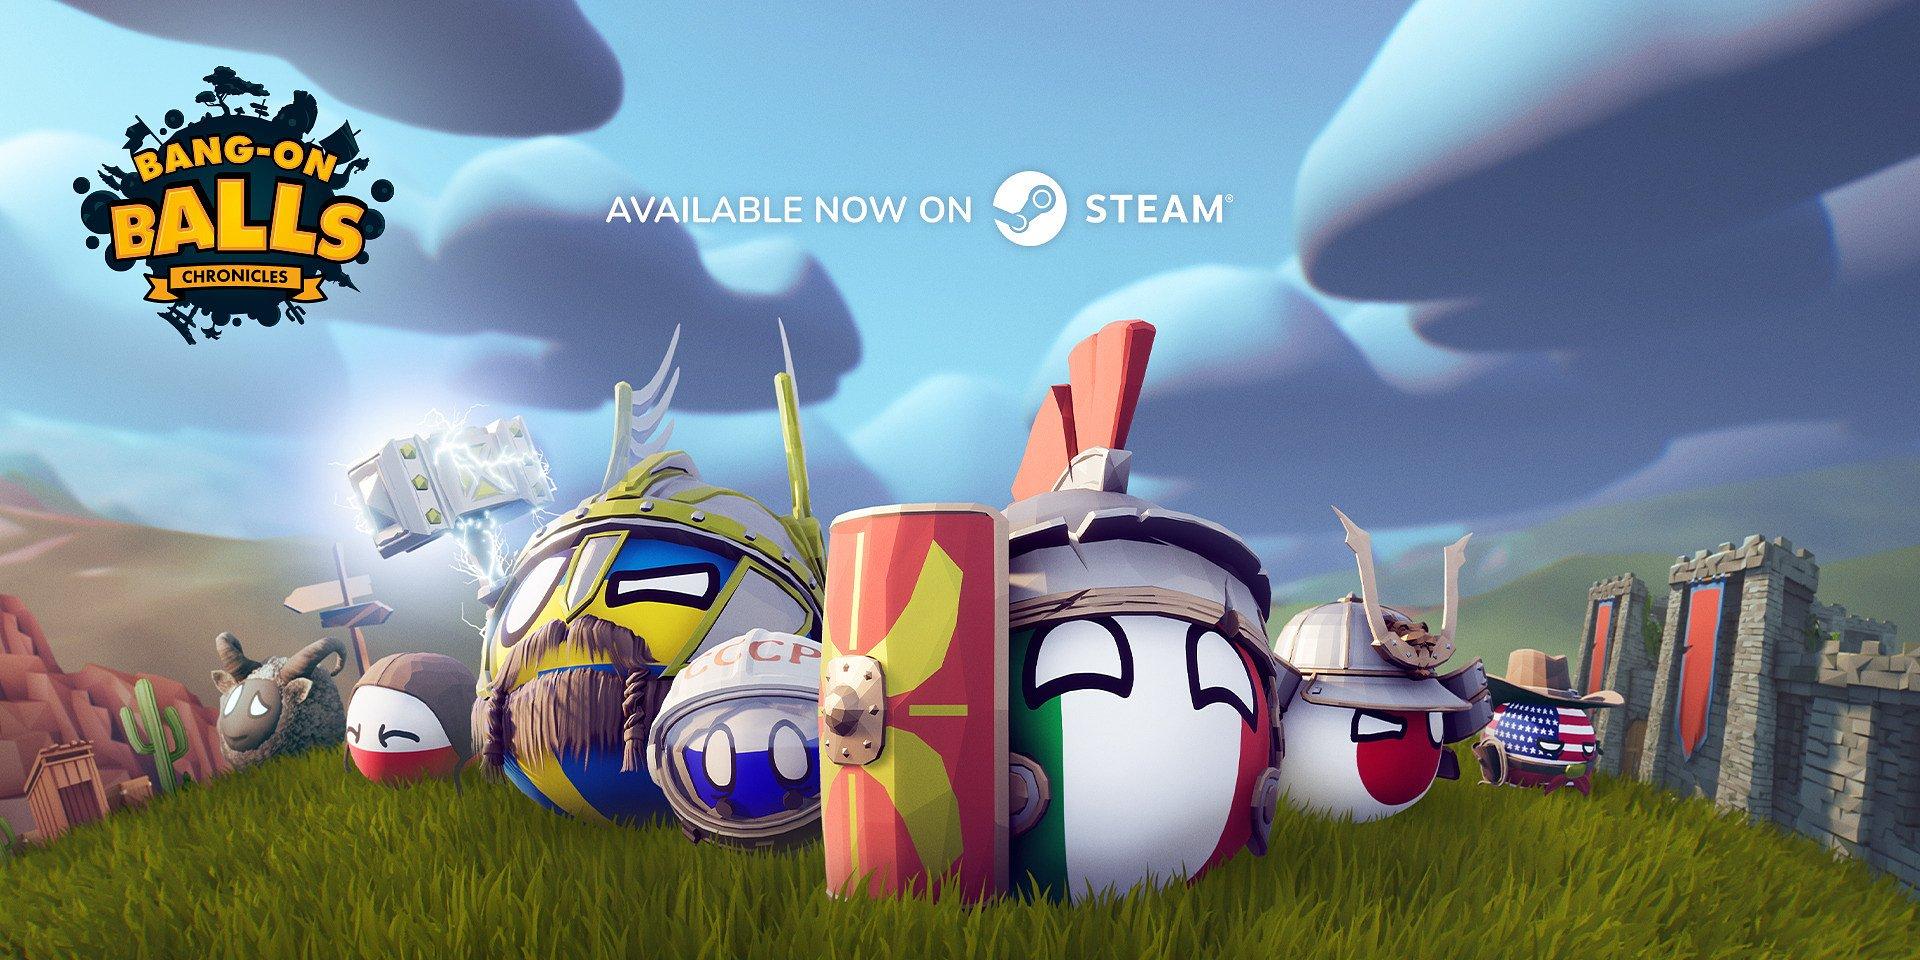 Кантрибол игра Bang-On Balls: Chronicles выкатилась в ранний доступ на Steam!